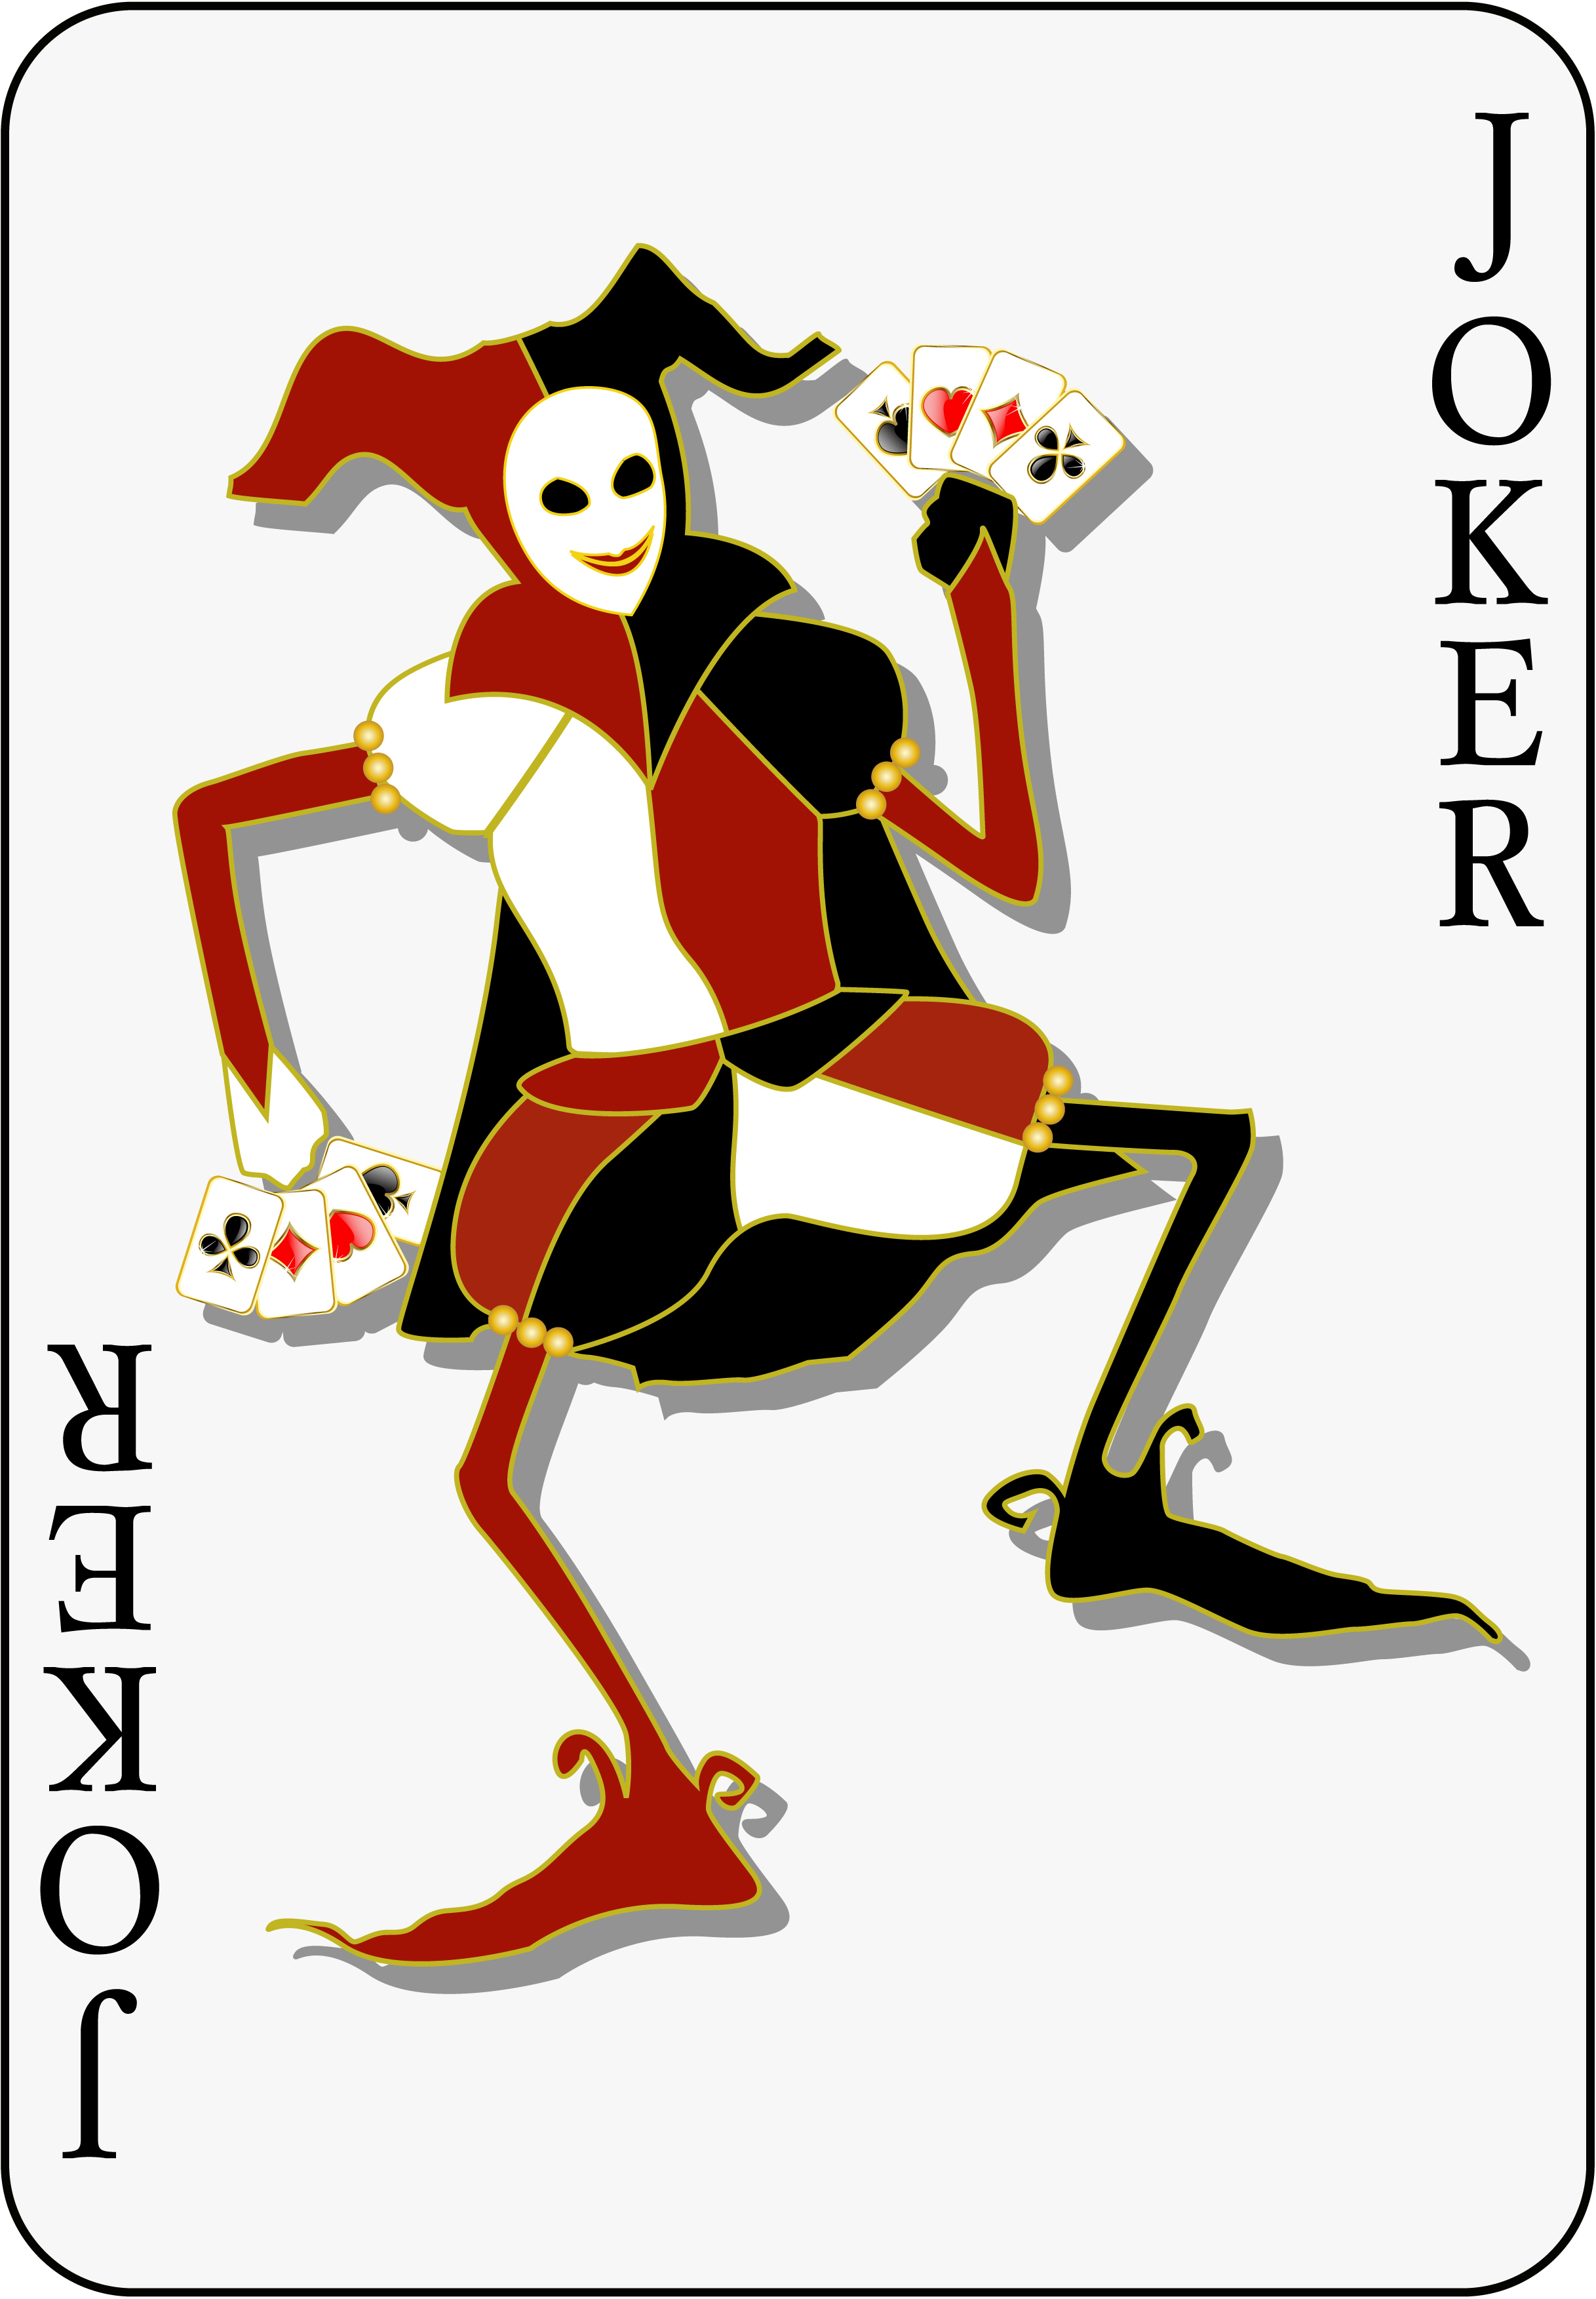 Free Joker Cards, Download Free Clip Art, Free Clip Art on.